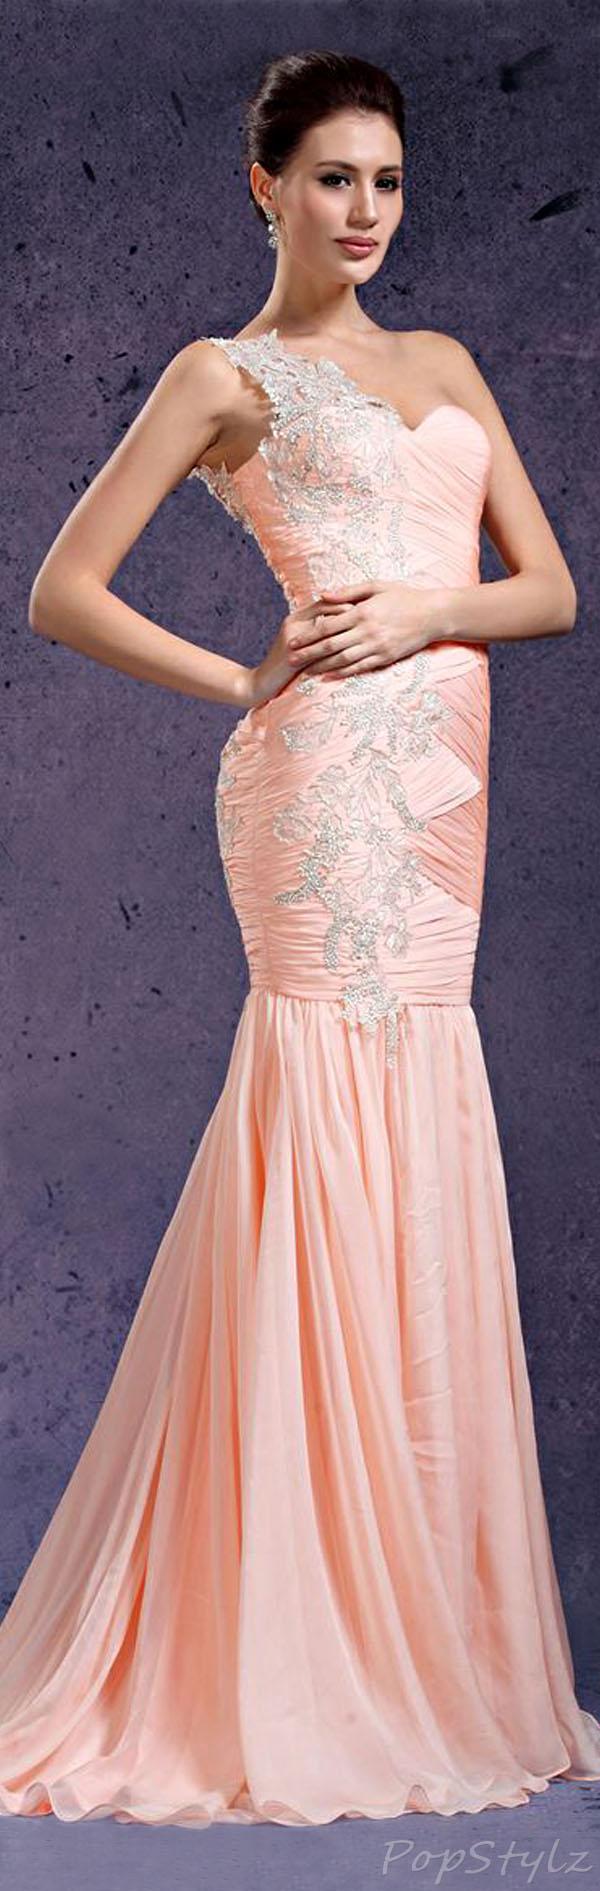 eDressit Pink Evening Gown jaglady | VESTIDOS TONOS CLAROS ...